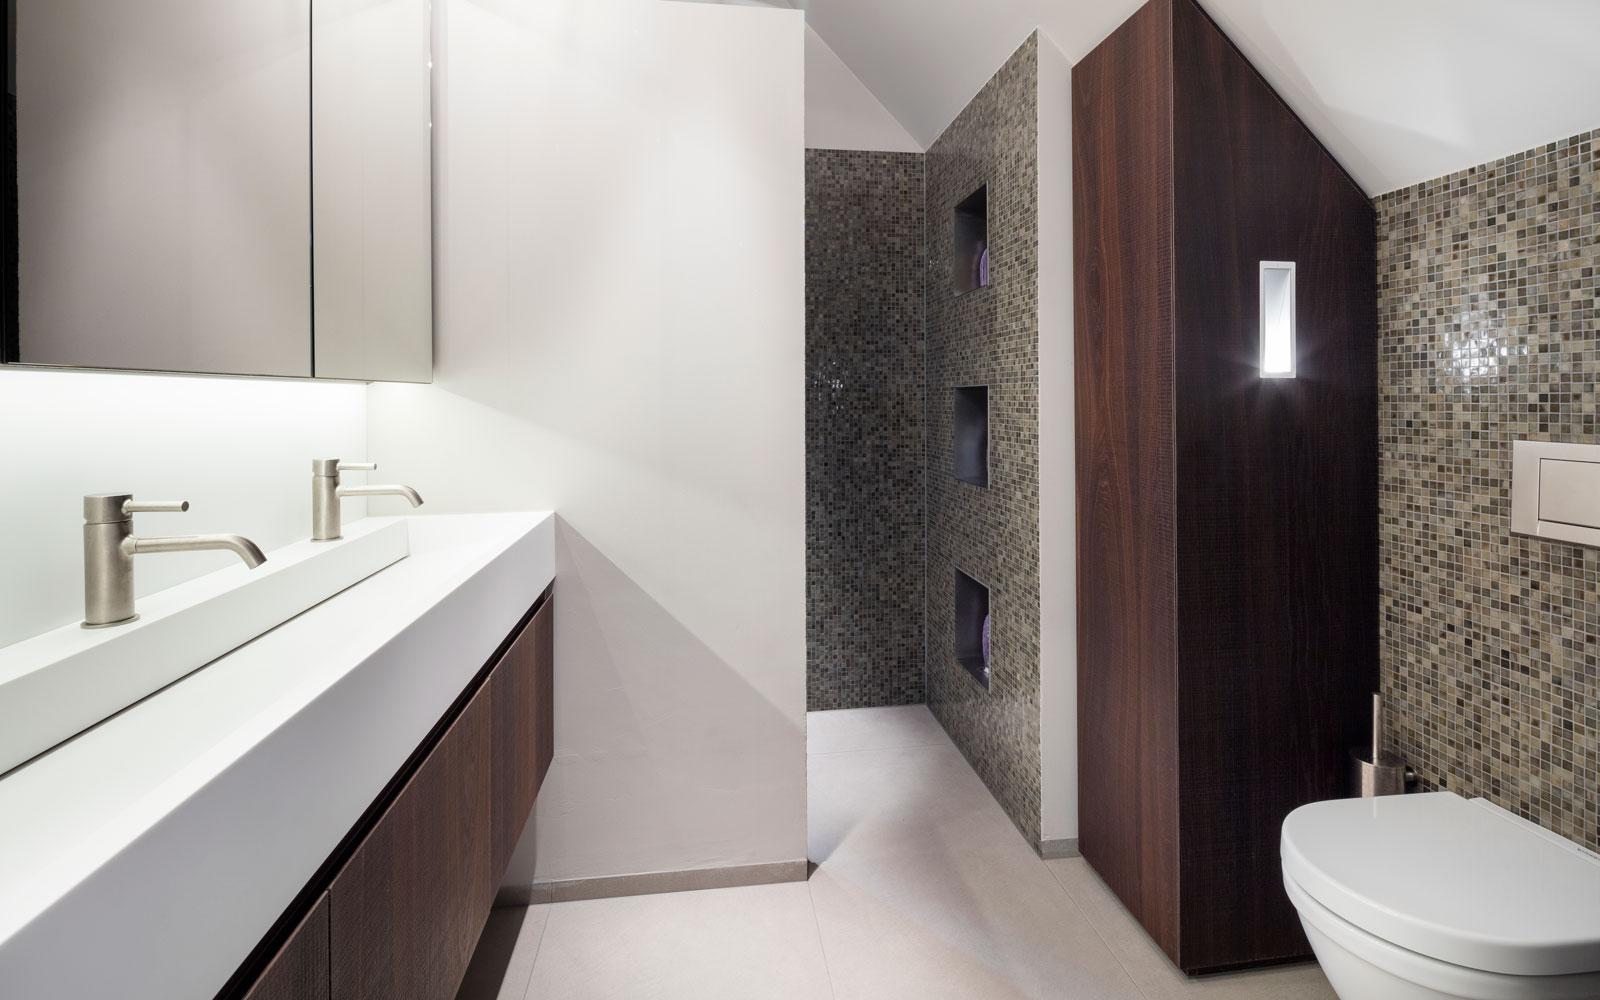 Badkamer, sanitair, Agape, wastafel, houten accenten, moderne villa, François Hannes